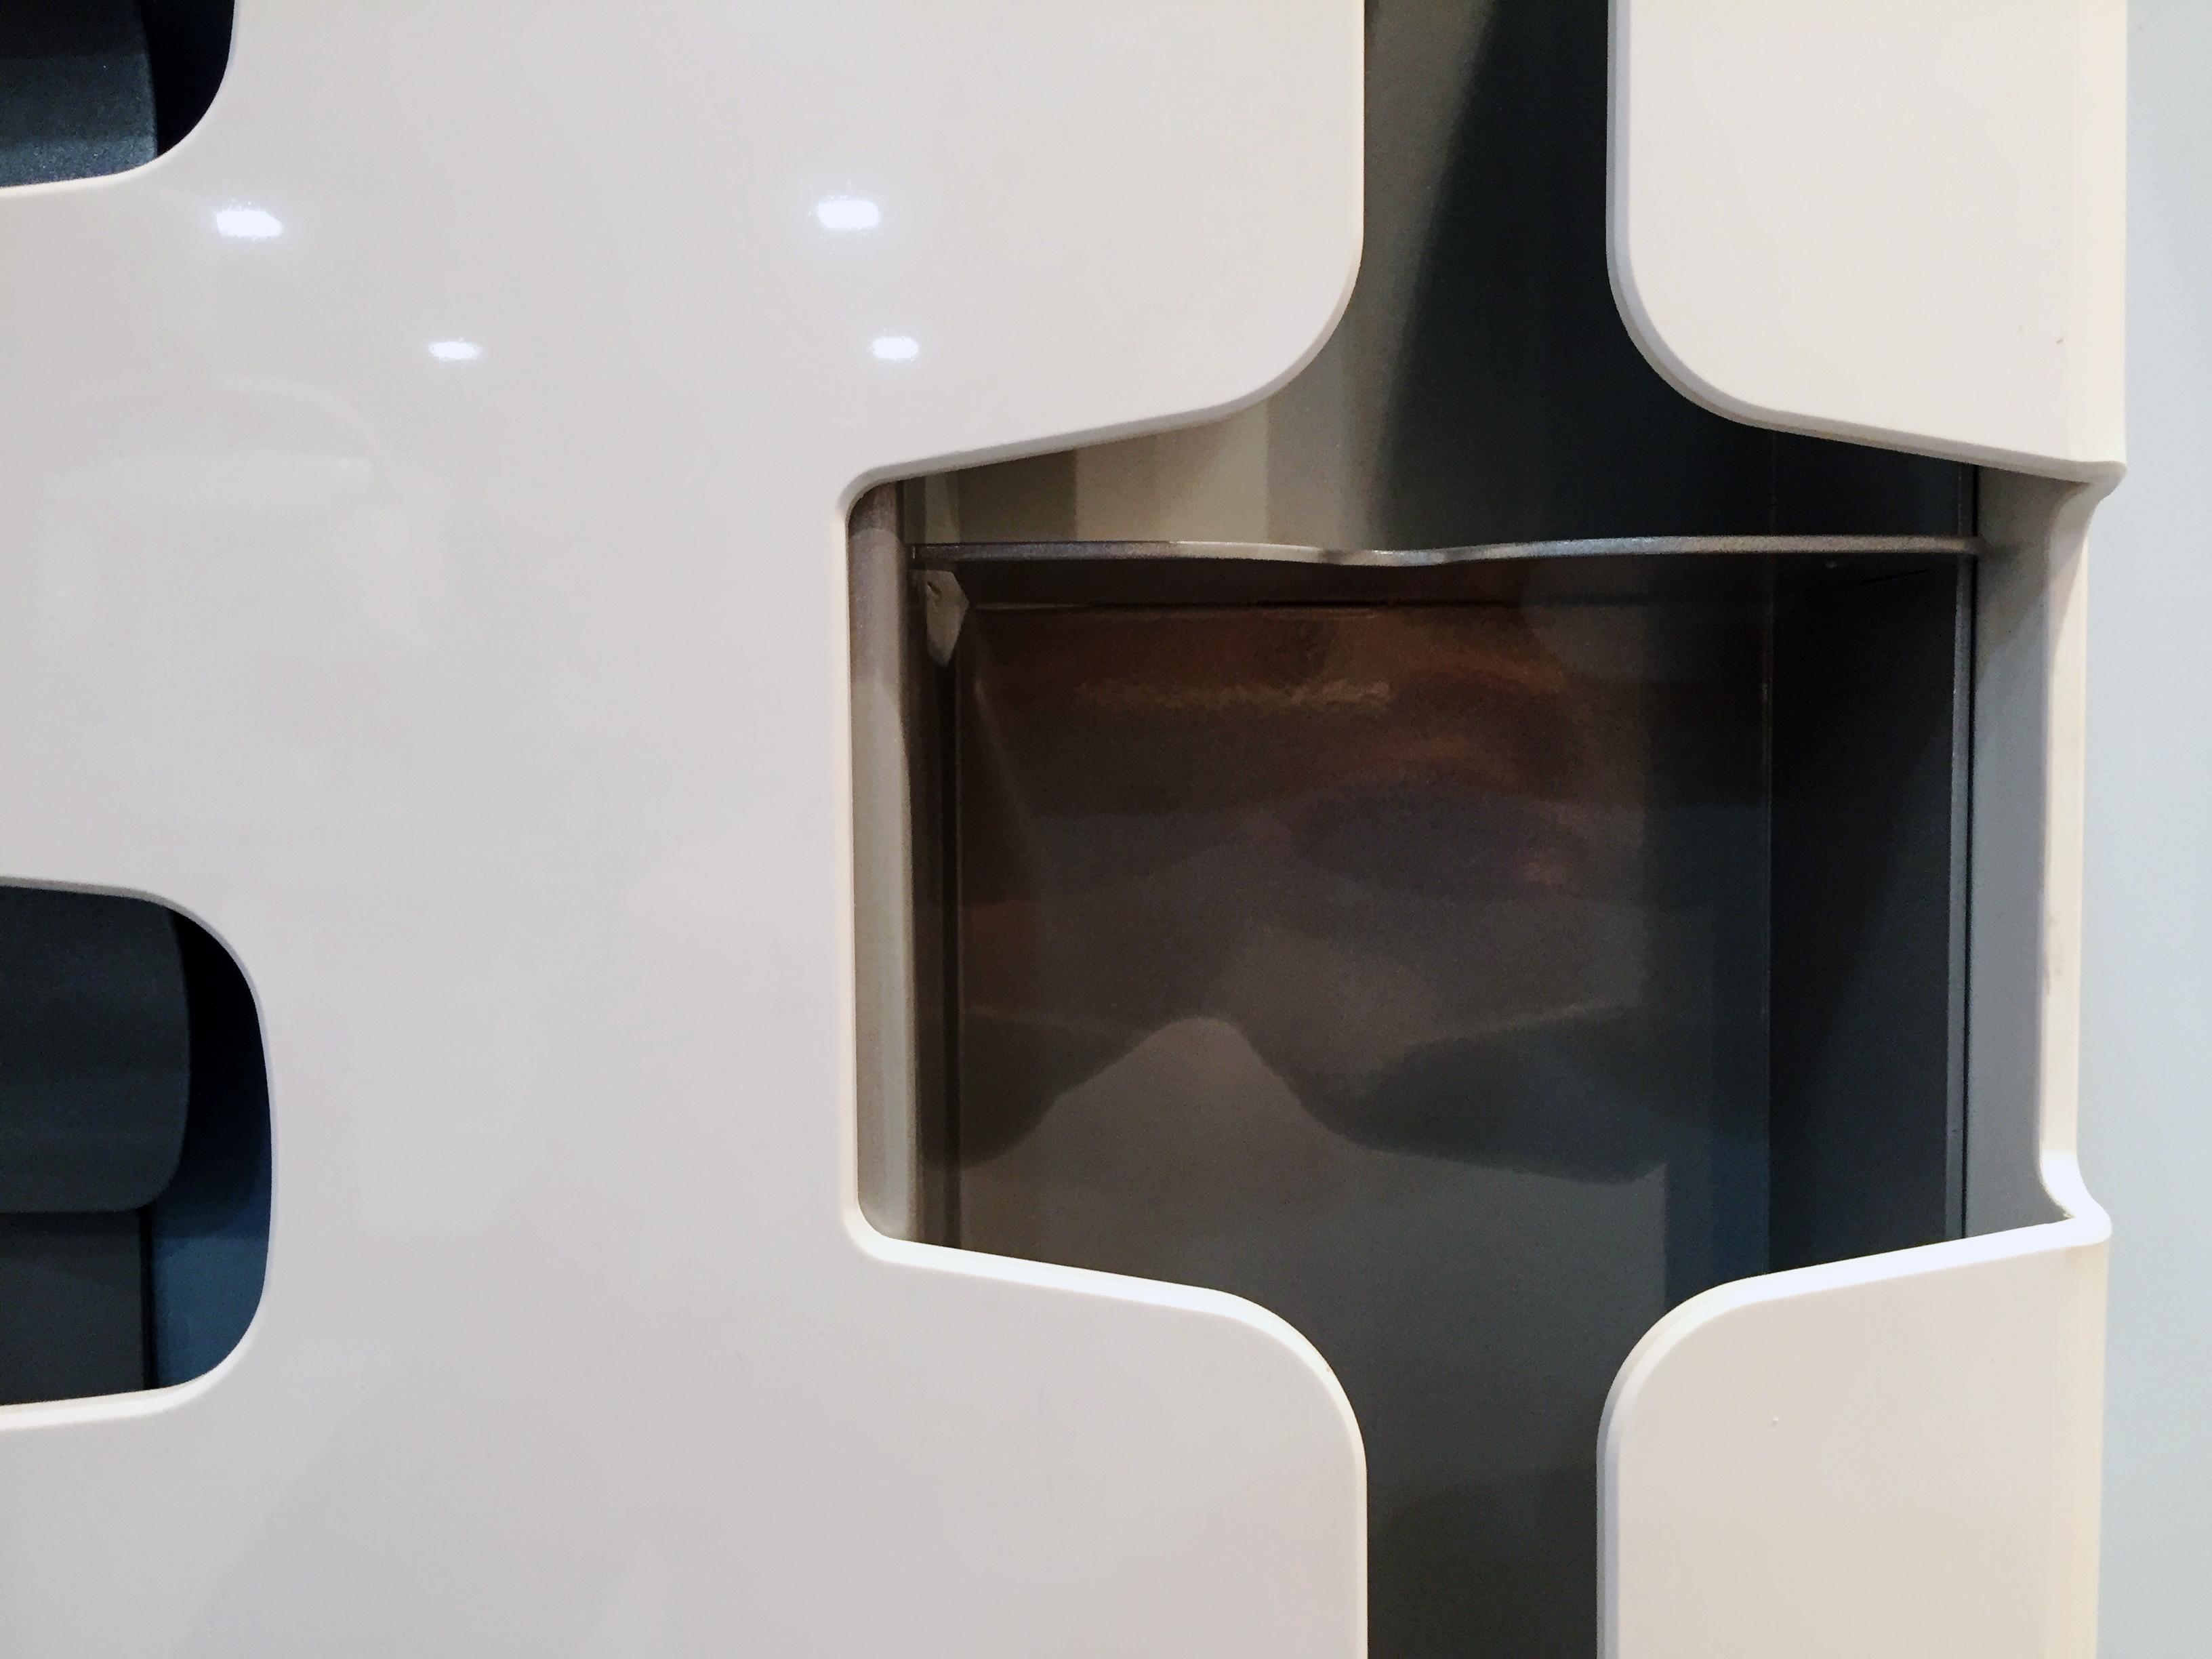 Wall Dispenser WD-03